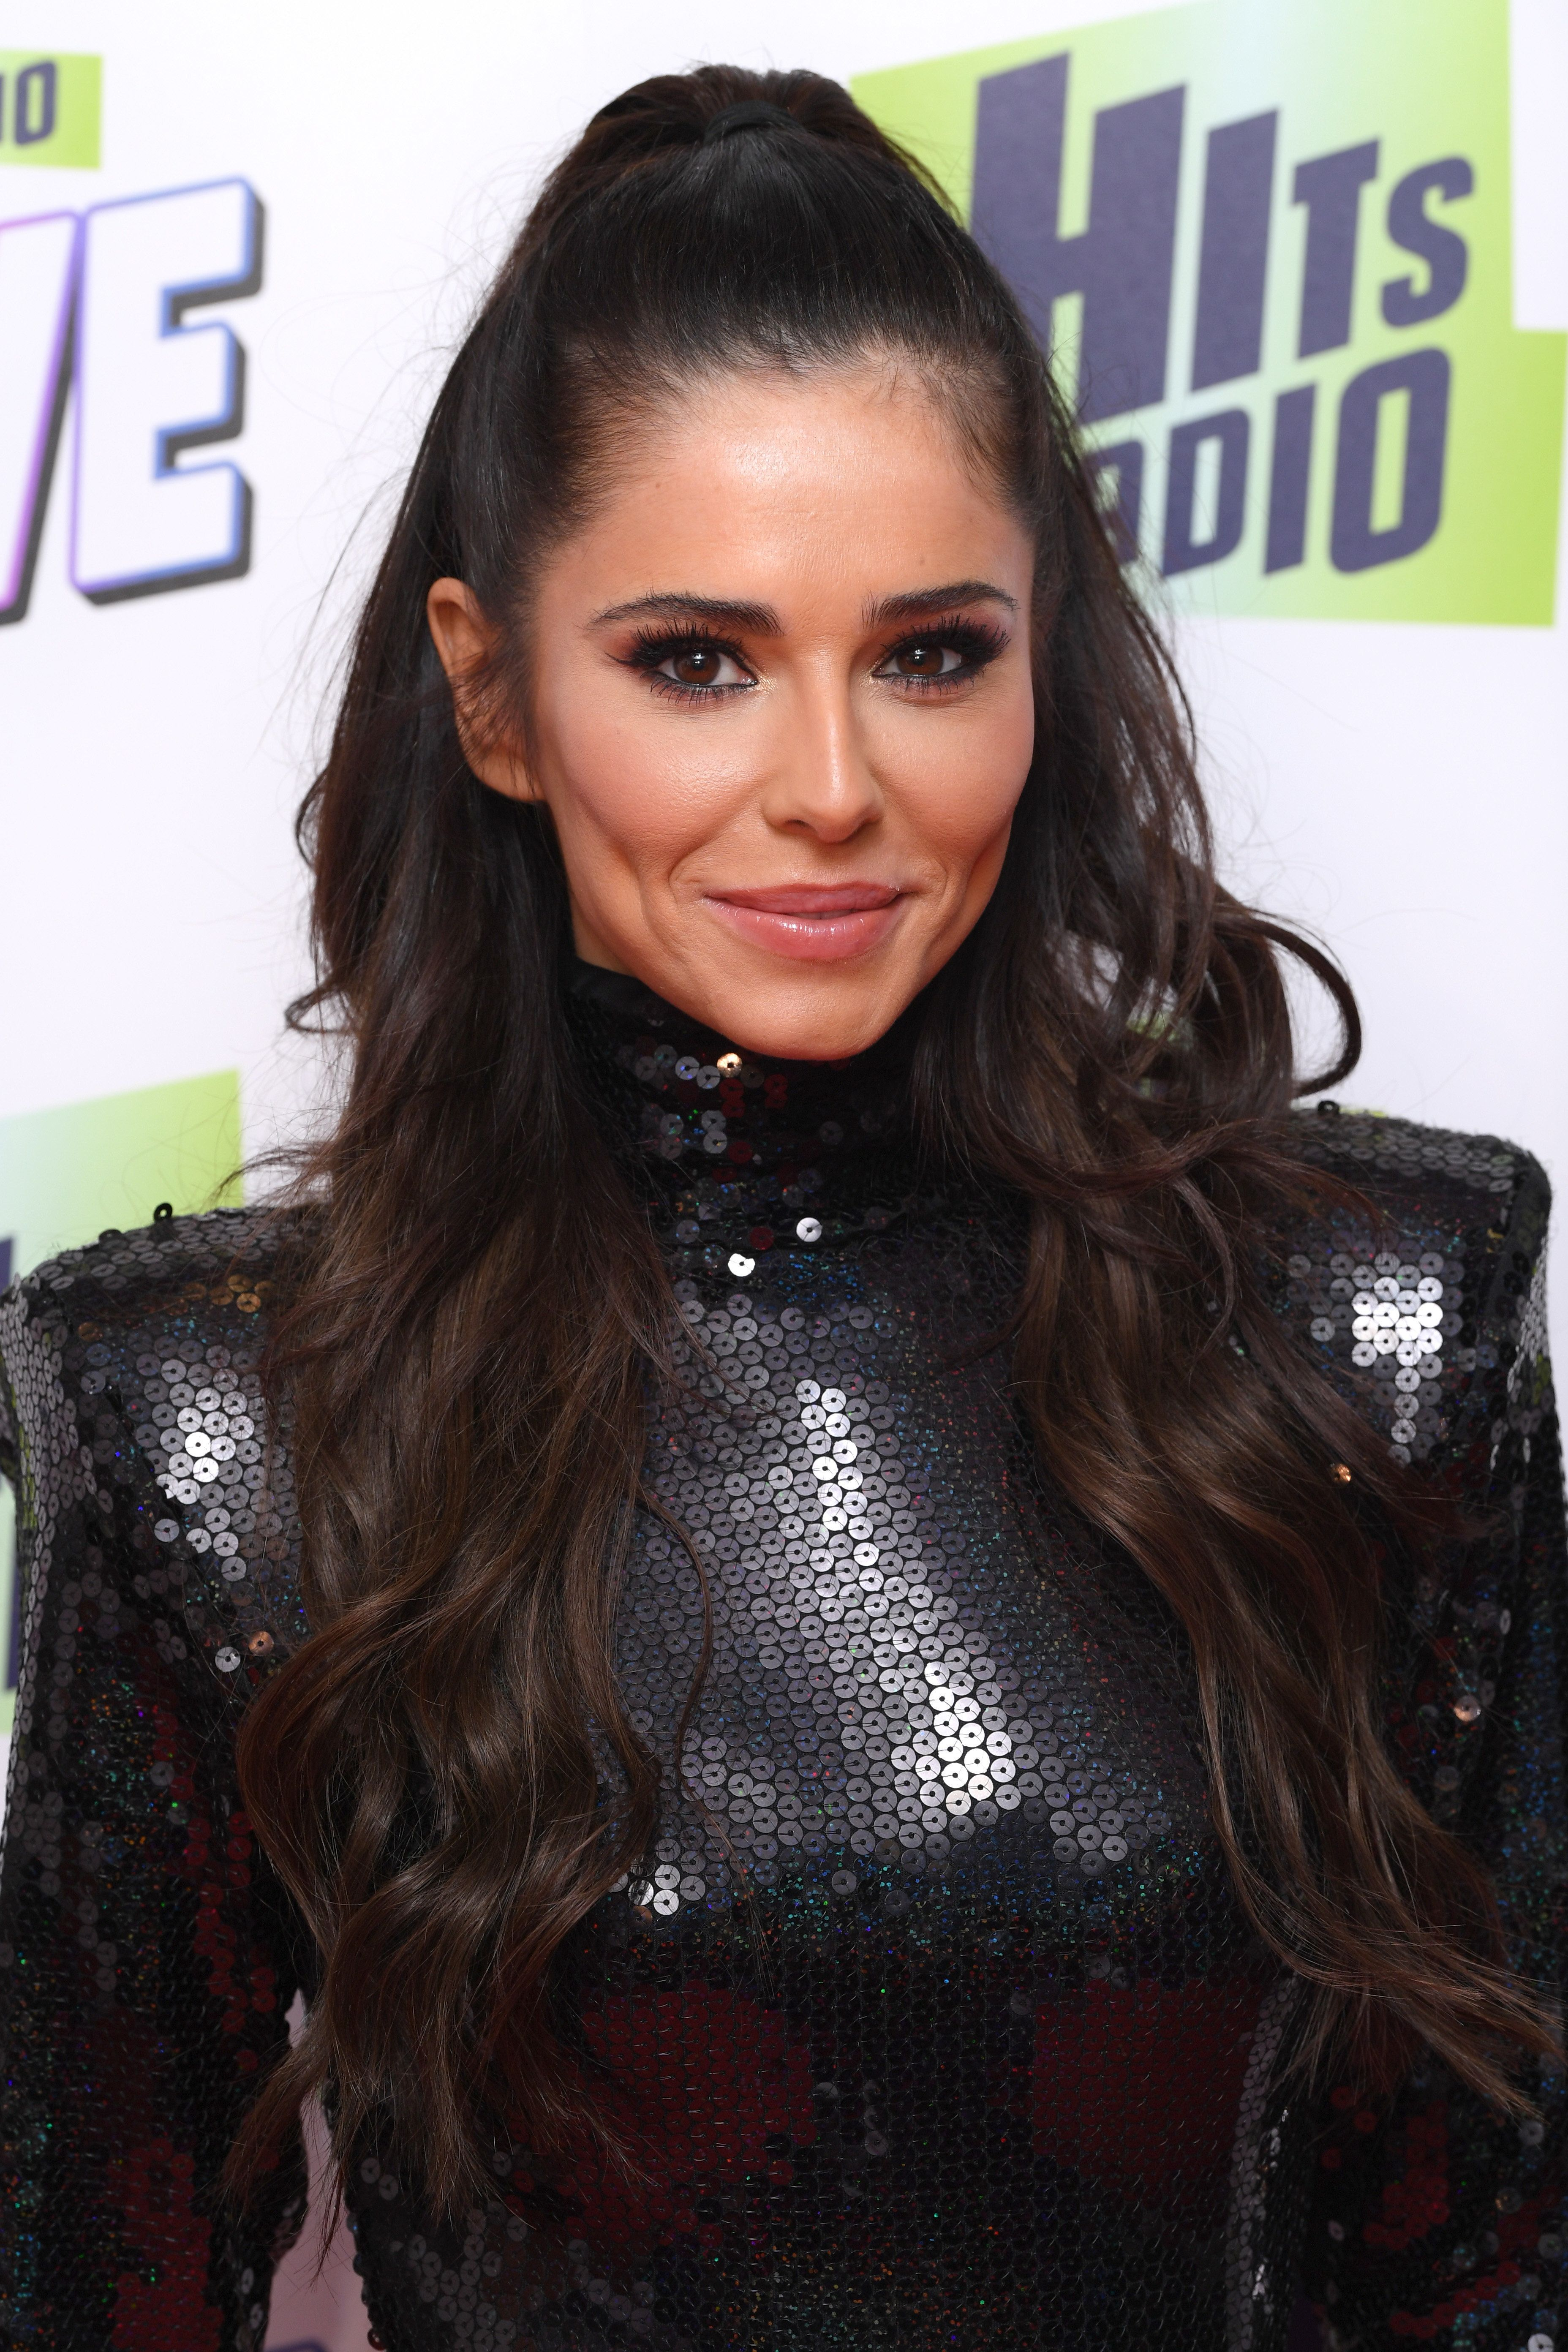 Cheryl Tweedy's Rep Hits Back At Claims Of 'Diva Behaviour' At Comeback